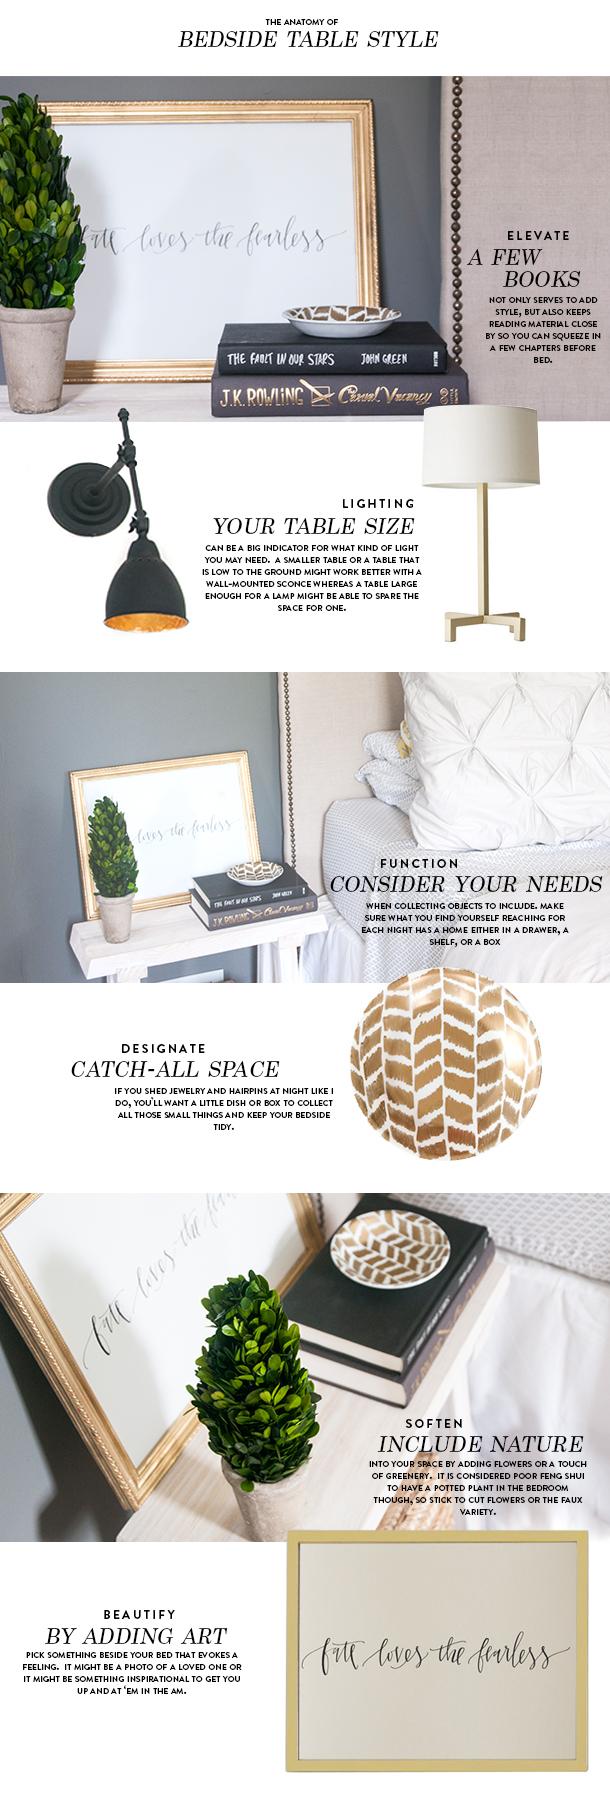 styling product breakdown - bedside table